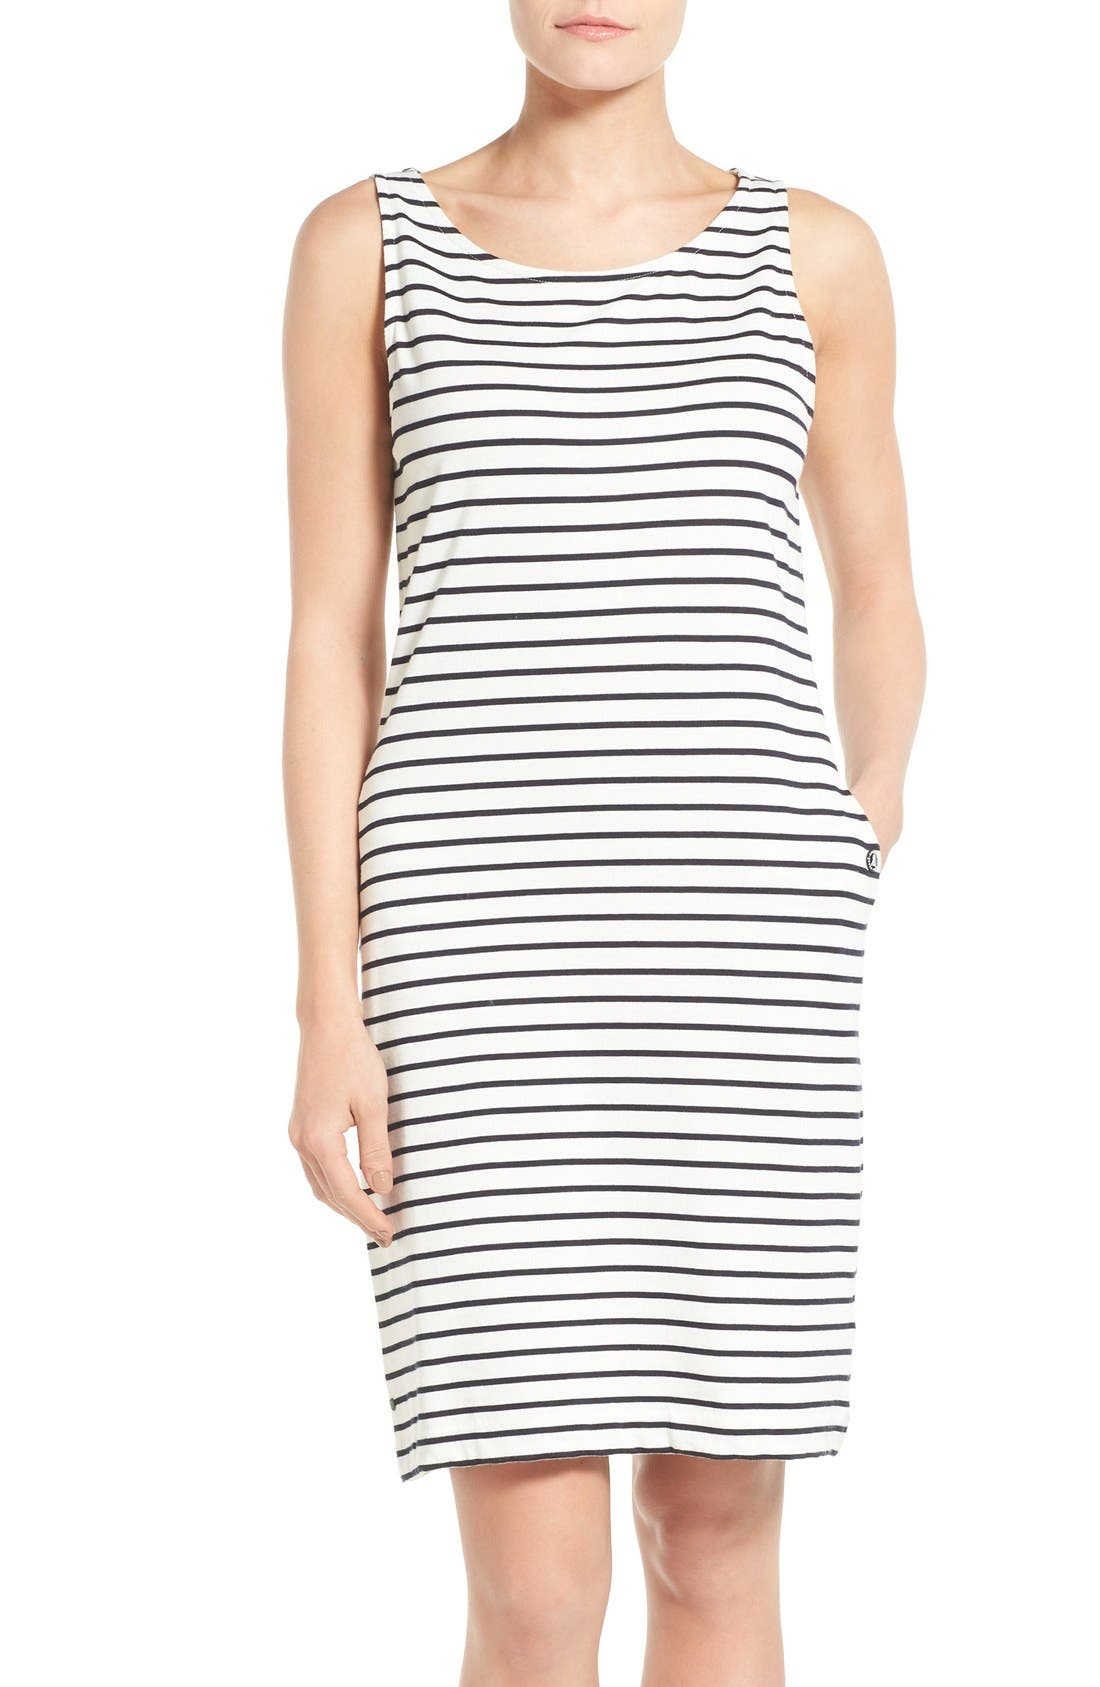 Dalmore Stripe Jersey Sleeveless Shift Dress,                         Main,                         color, White/ Navy